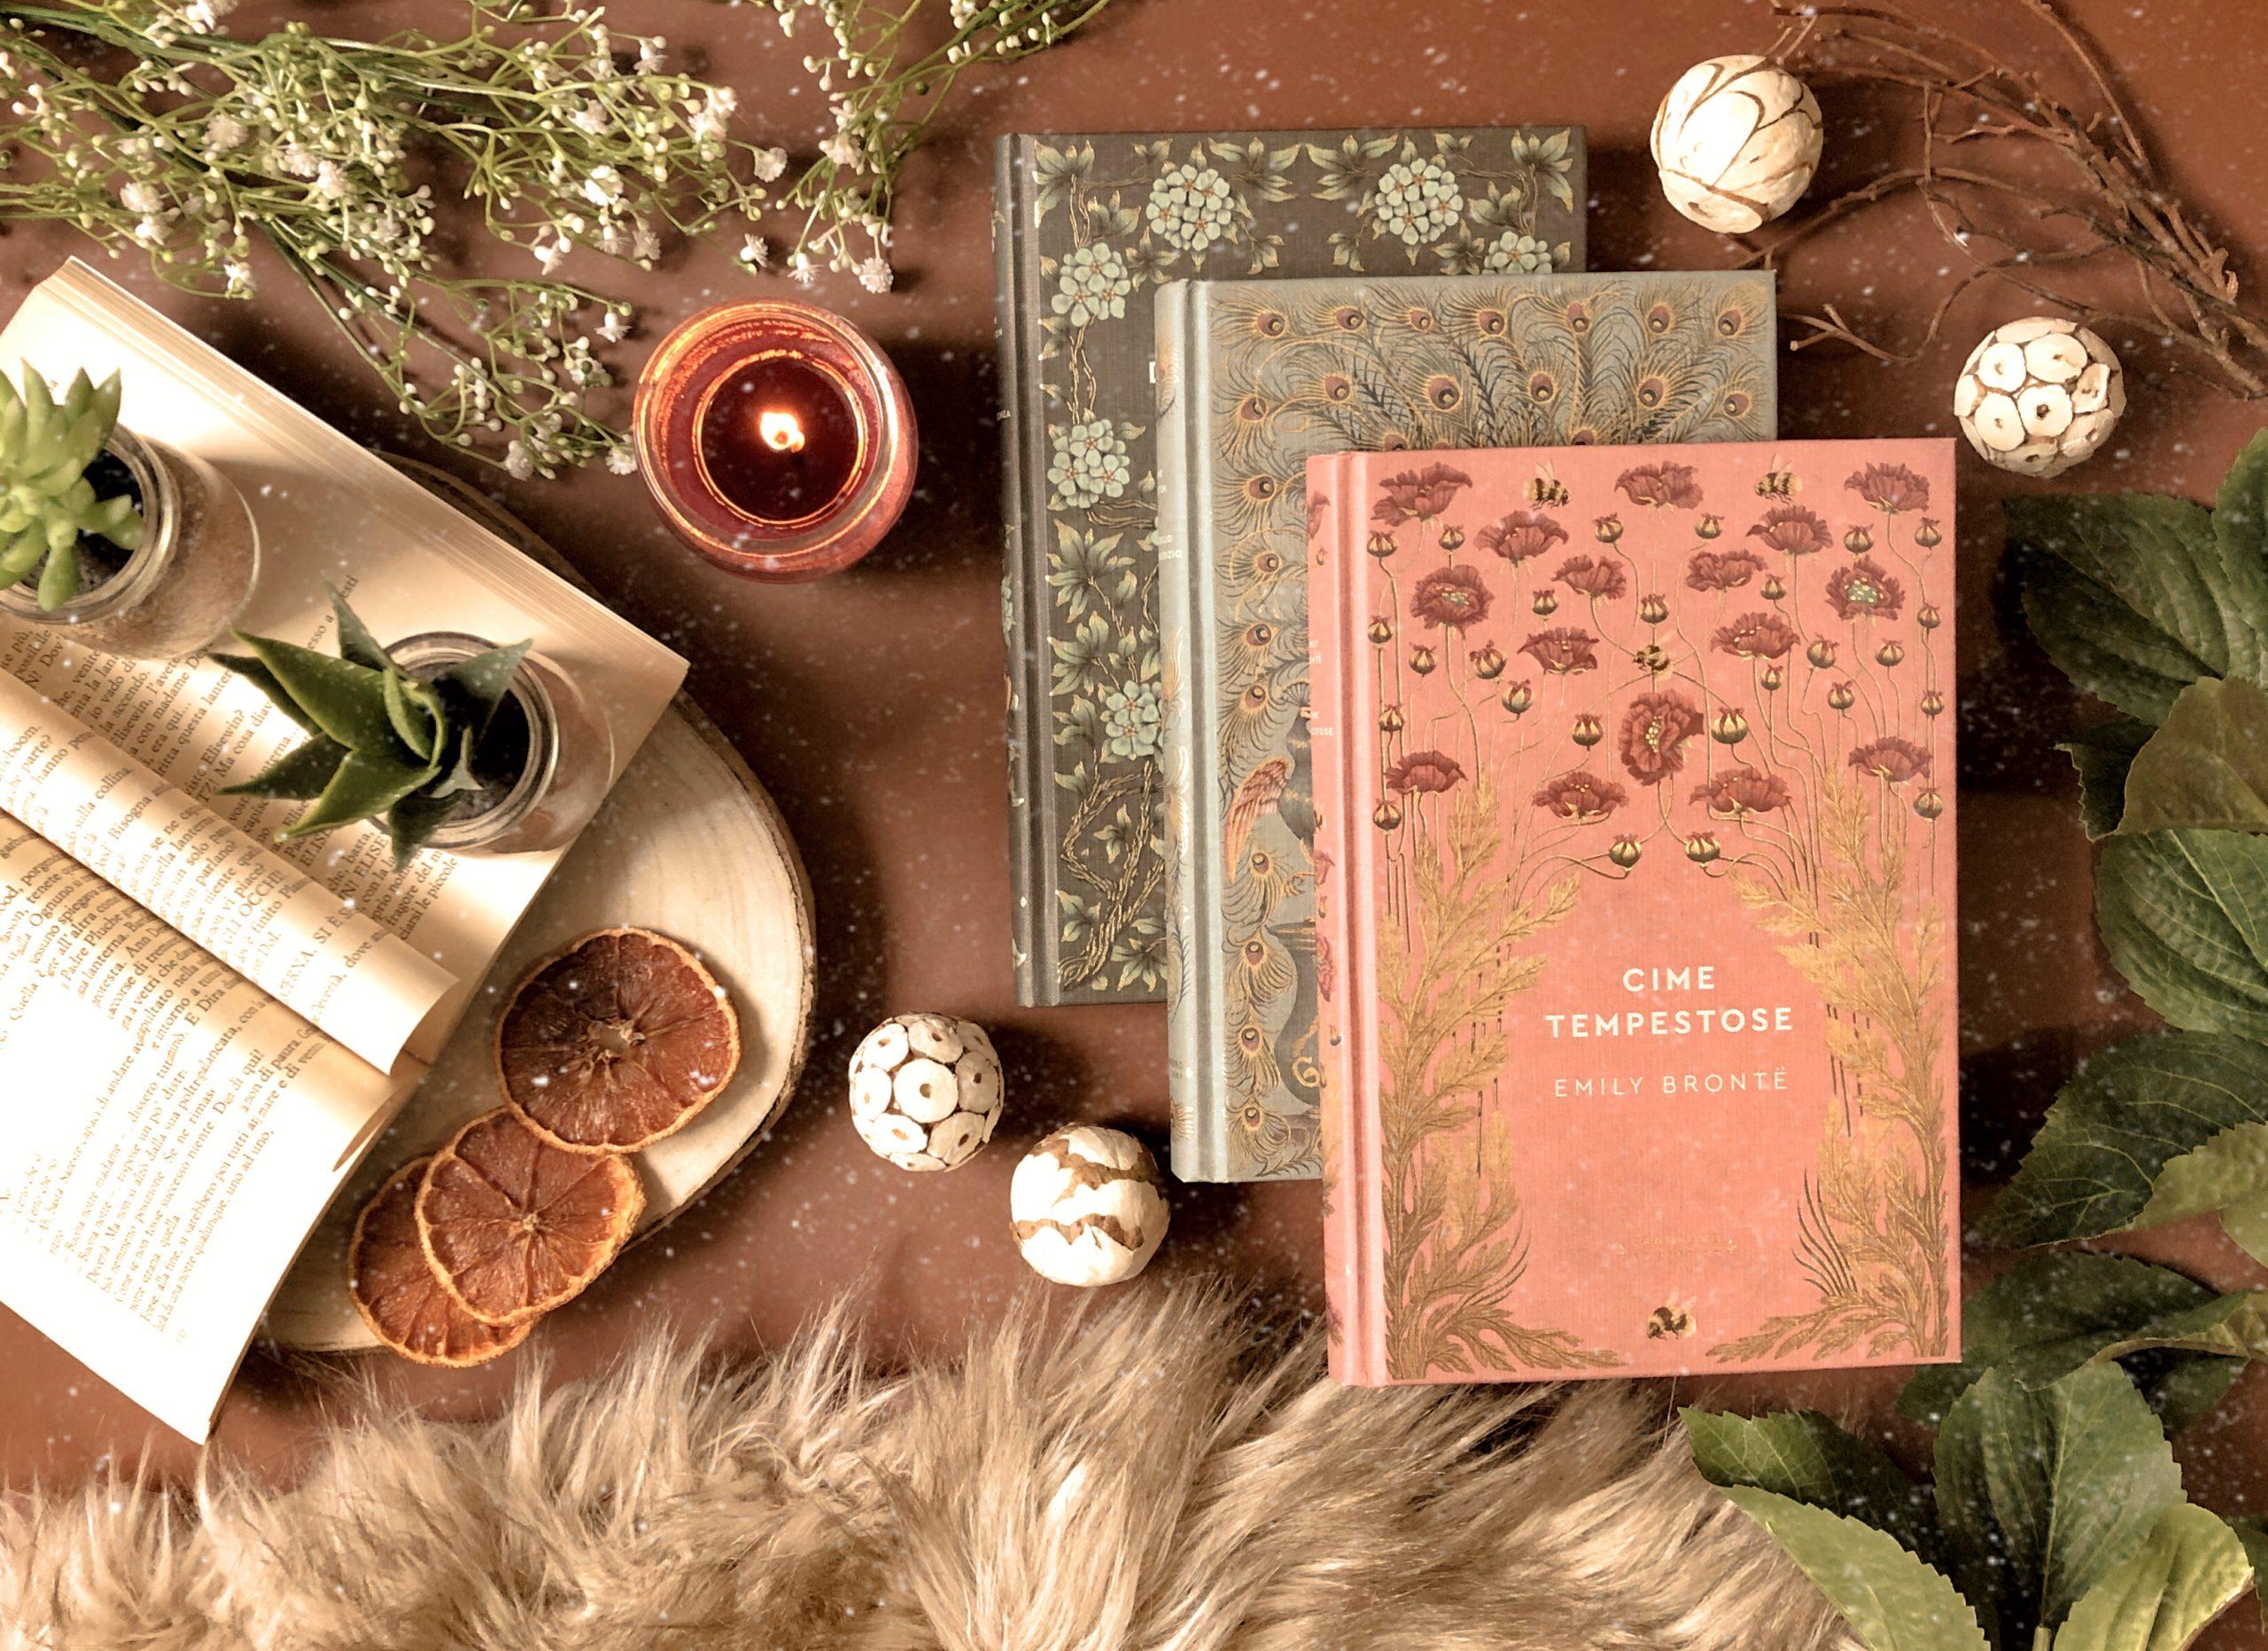 Cime tempestose – Emily Brontë